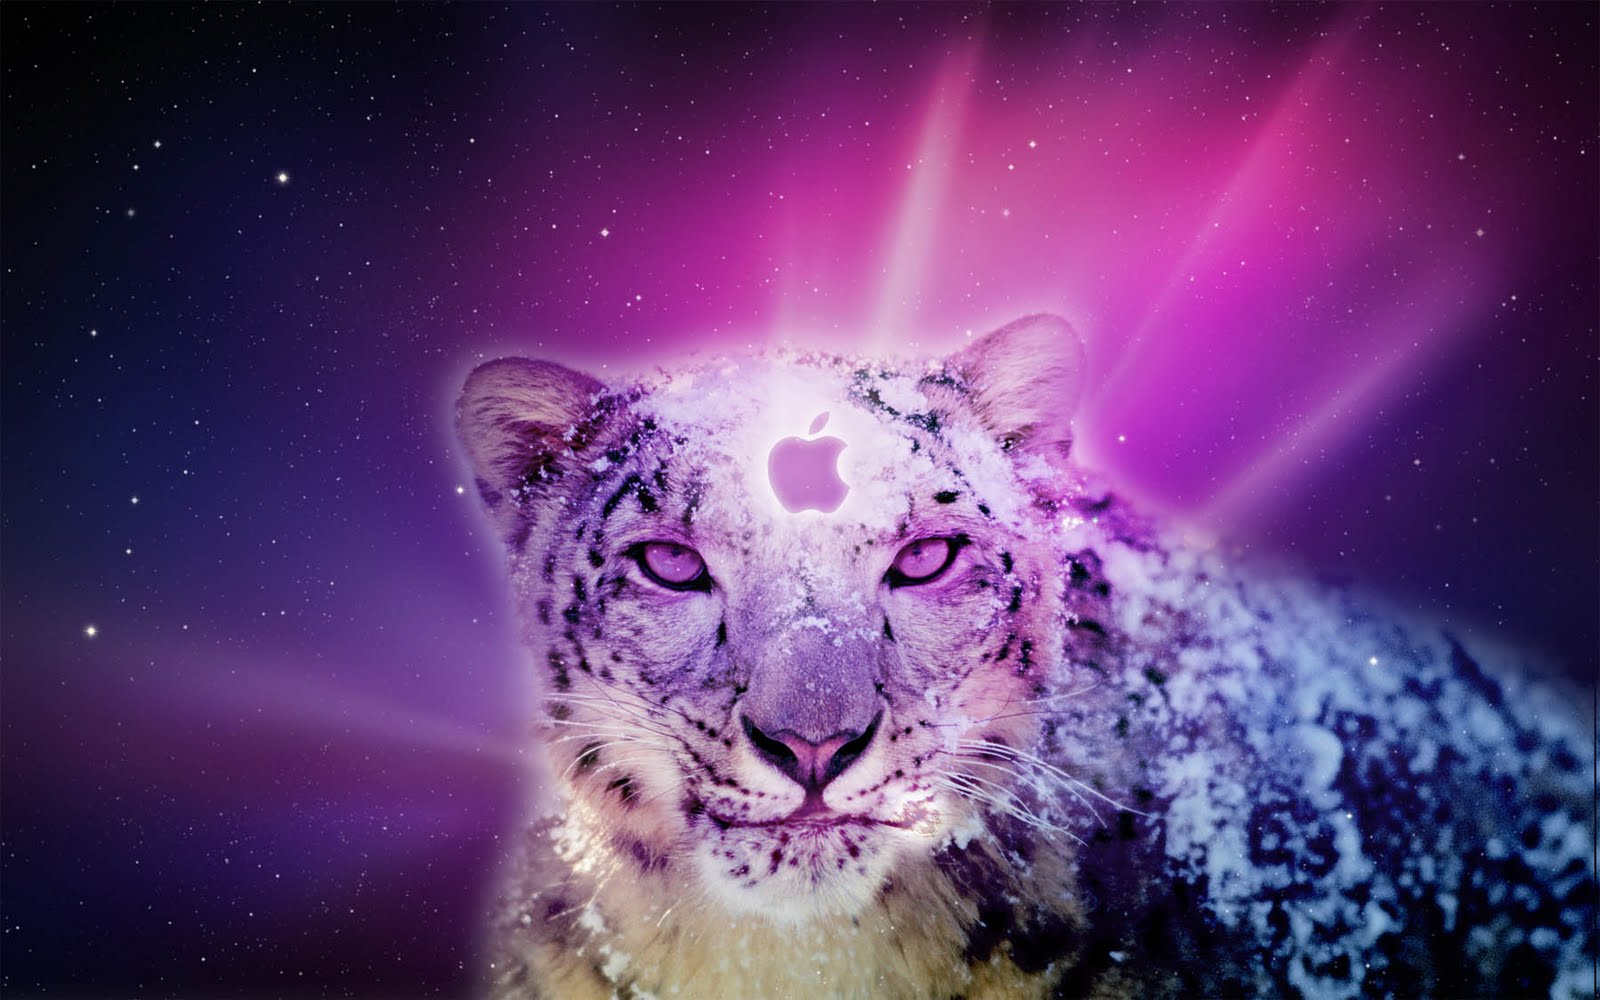 Apple Mac OS X Snow Leopard